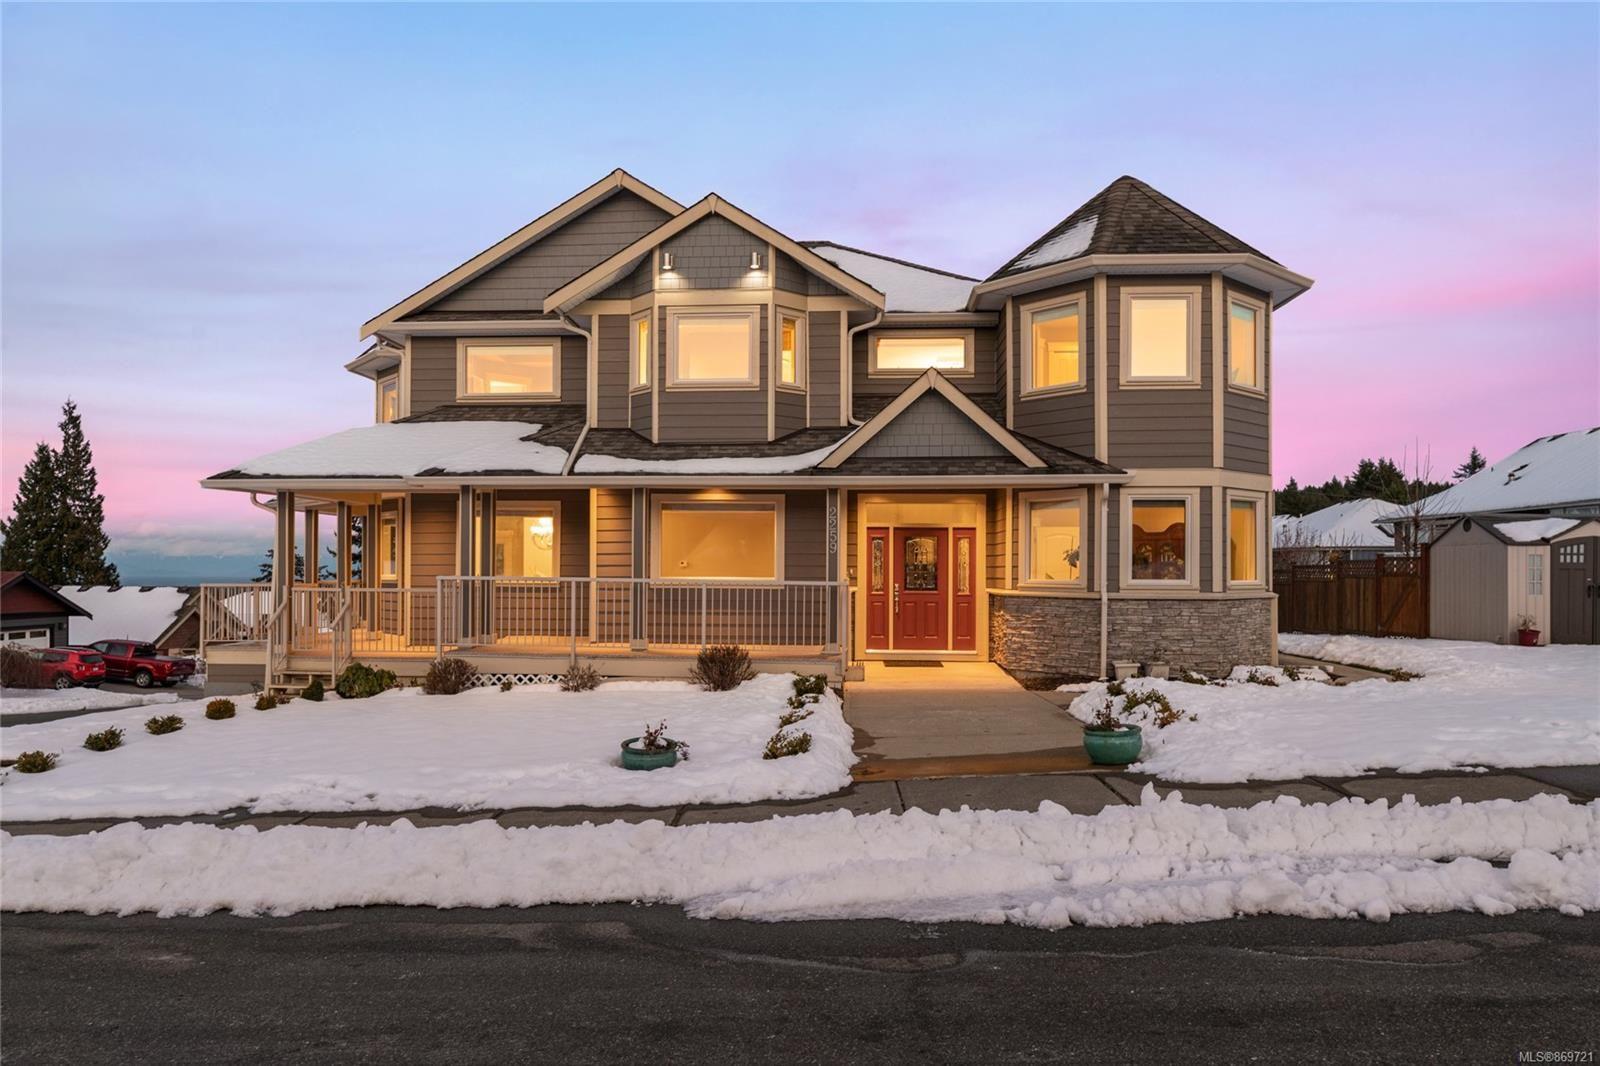 Photo 43: Photos: 2259 Leighton Rd in : Na South Jingle Pot House for sale (Nanaimo)  : MLS®# 869721